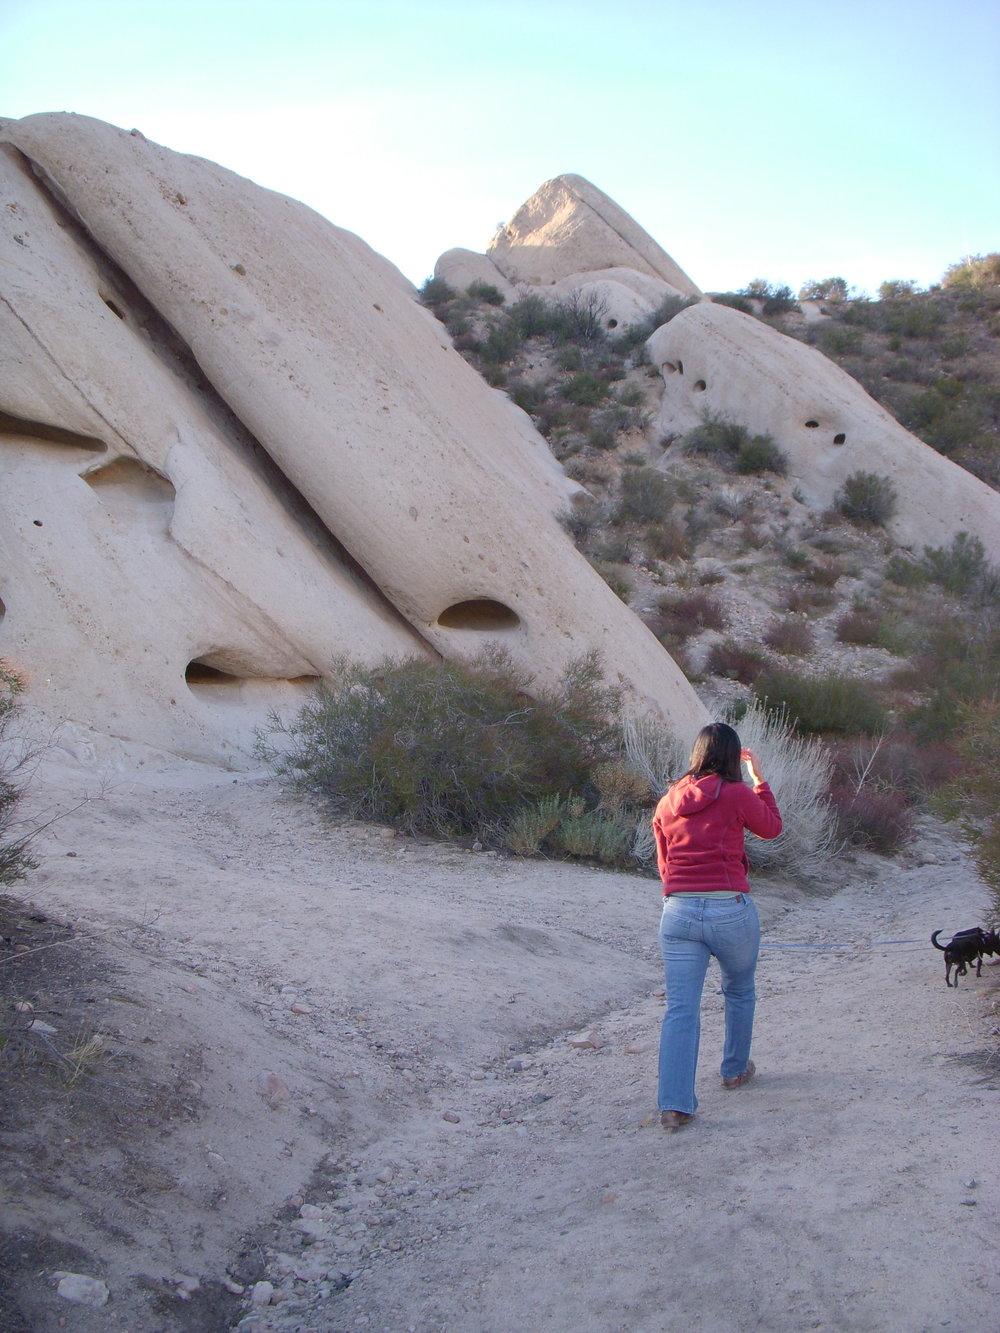 Mai on the trail